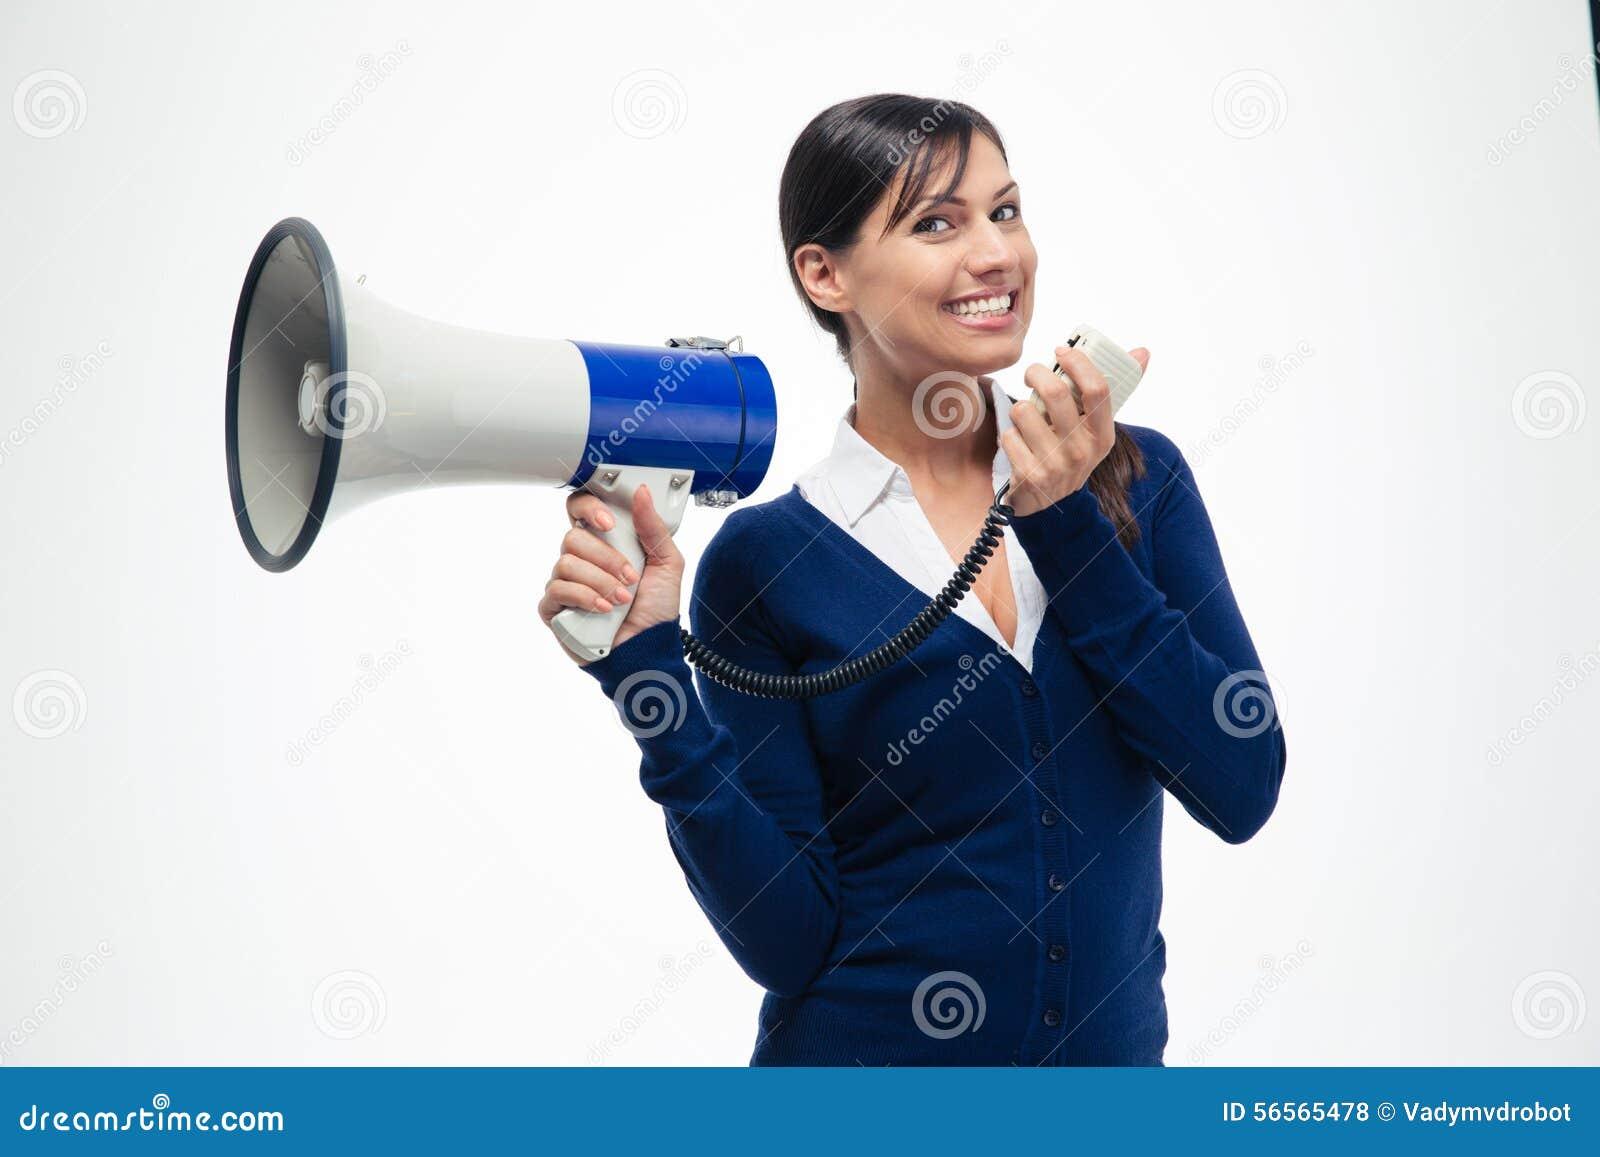 Download Εύθυμο Megaphone εκμετάλλευσης επιχειρηματιών Στοκ Εικόνες - εικόνα από κυρία, επικοινωνήστε: 56565478